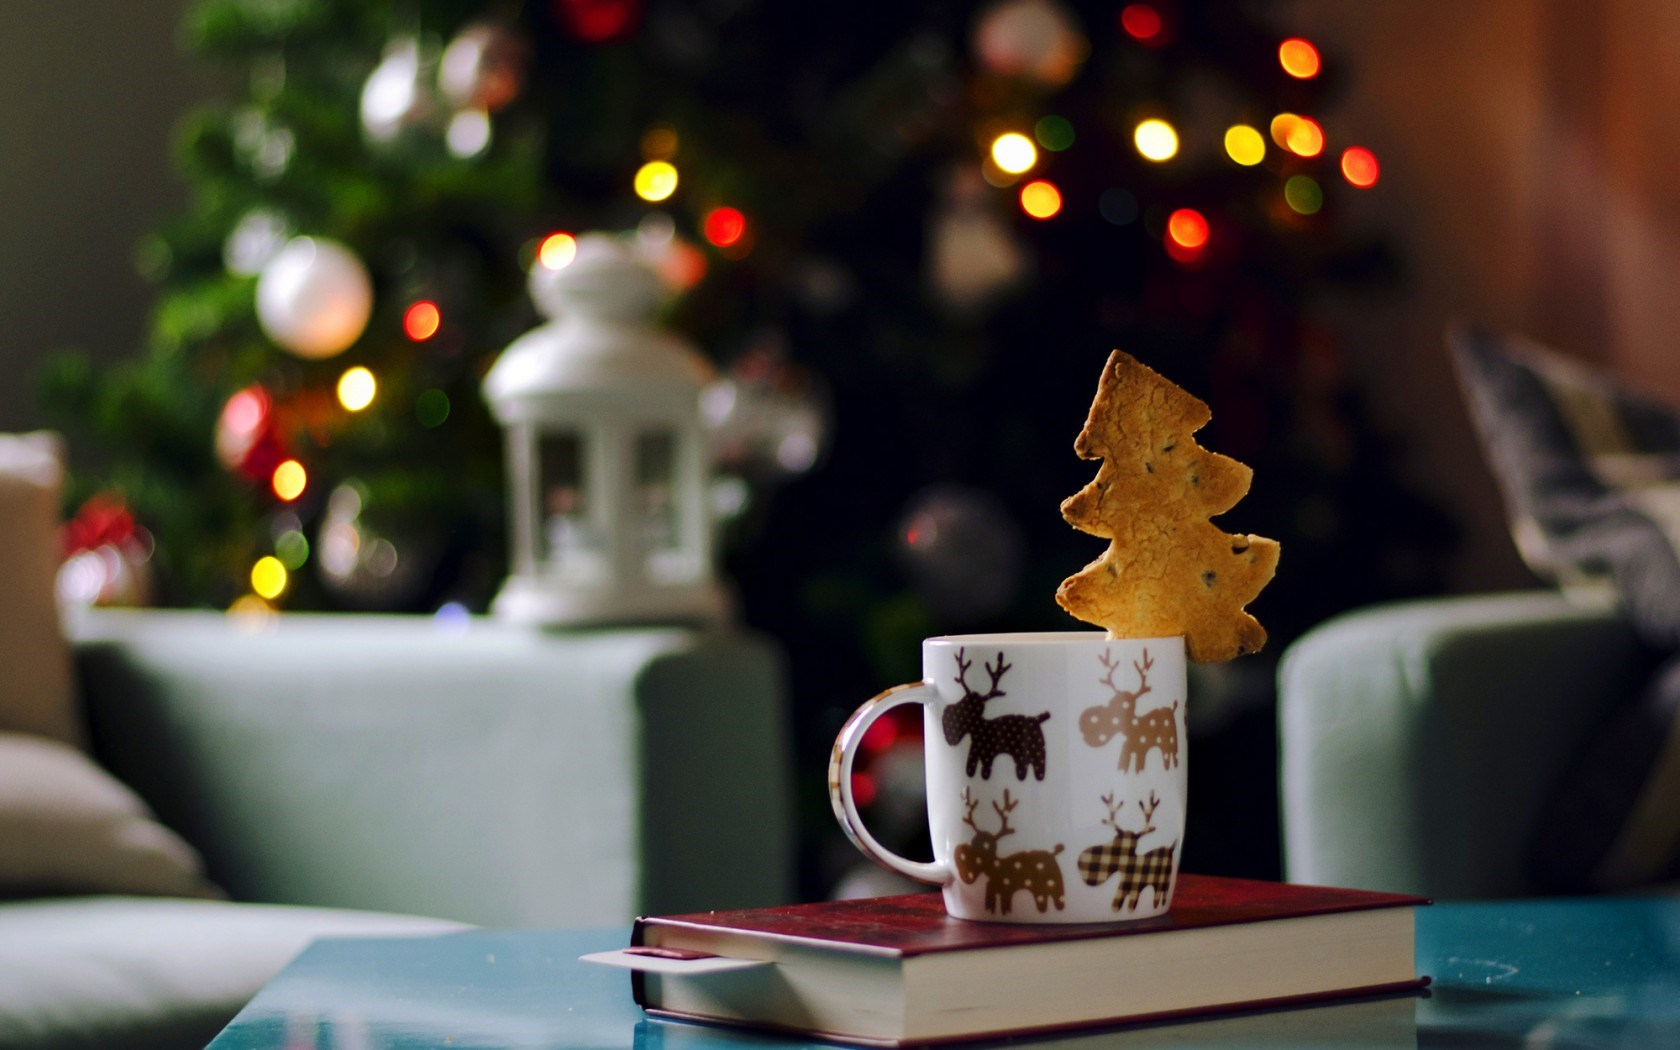 Mug Cup Cookies Book Christmas Tree Lights Garland Holiday New Year